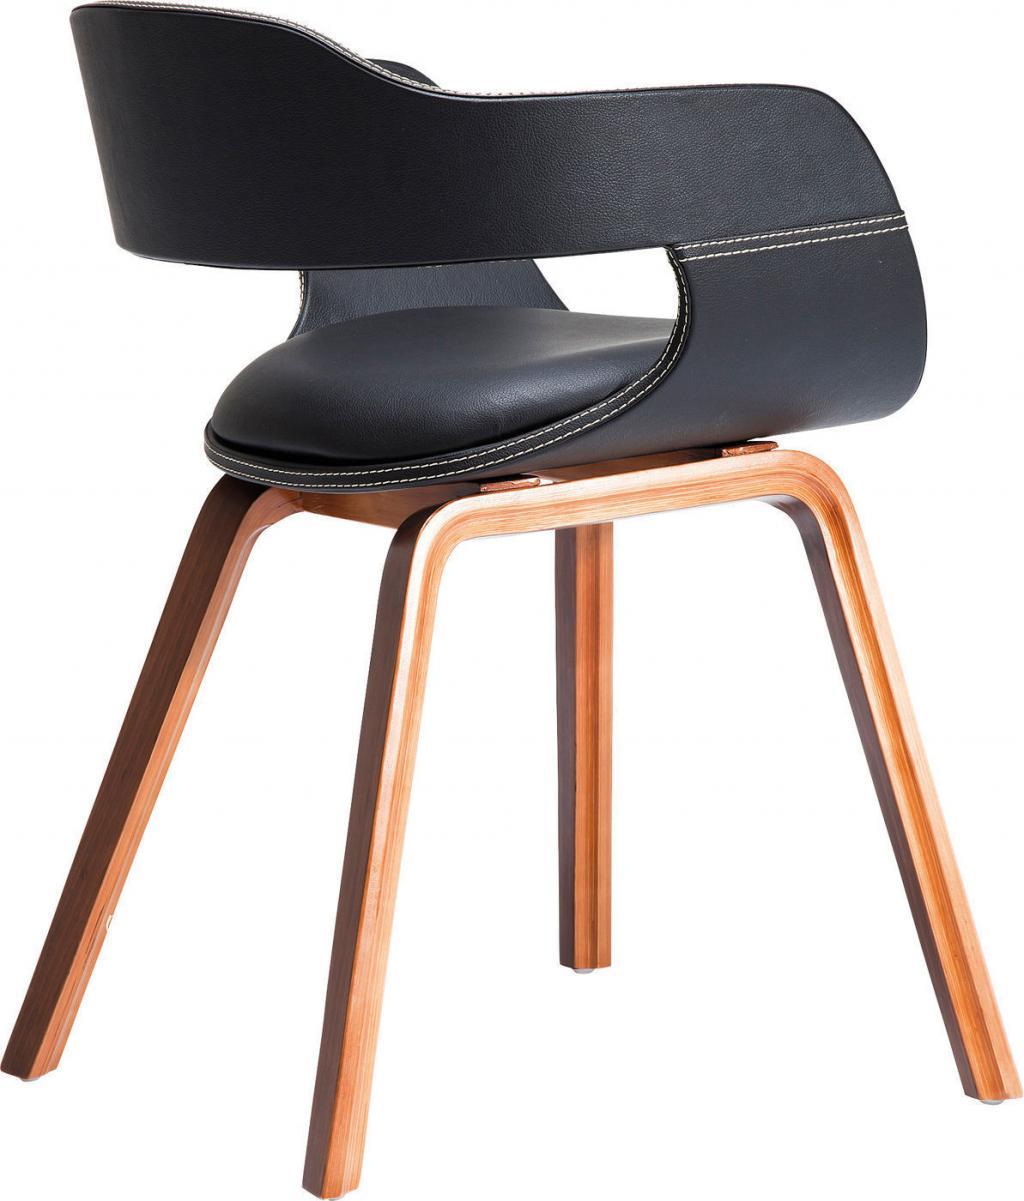 Kare Design Eetkamerstoel Costa Walnut Bruin - Designwonen.com ...